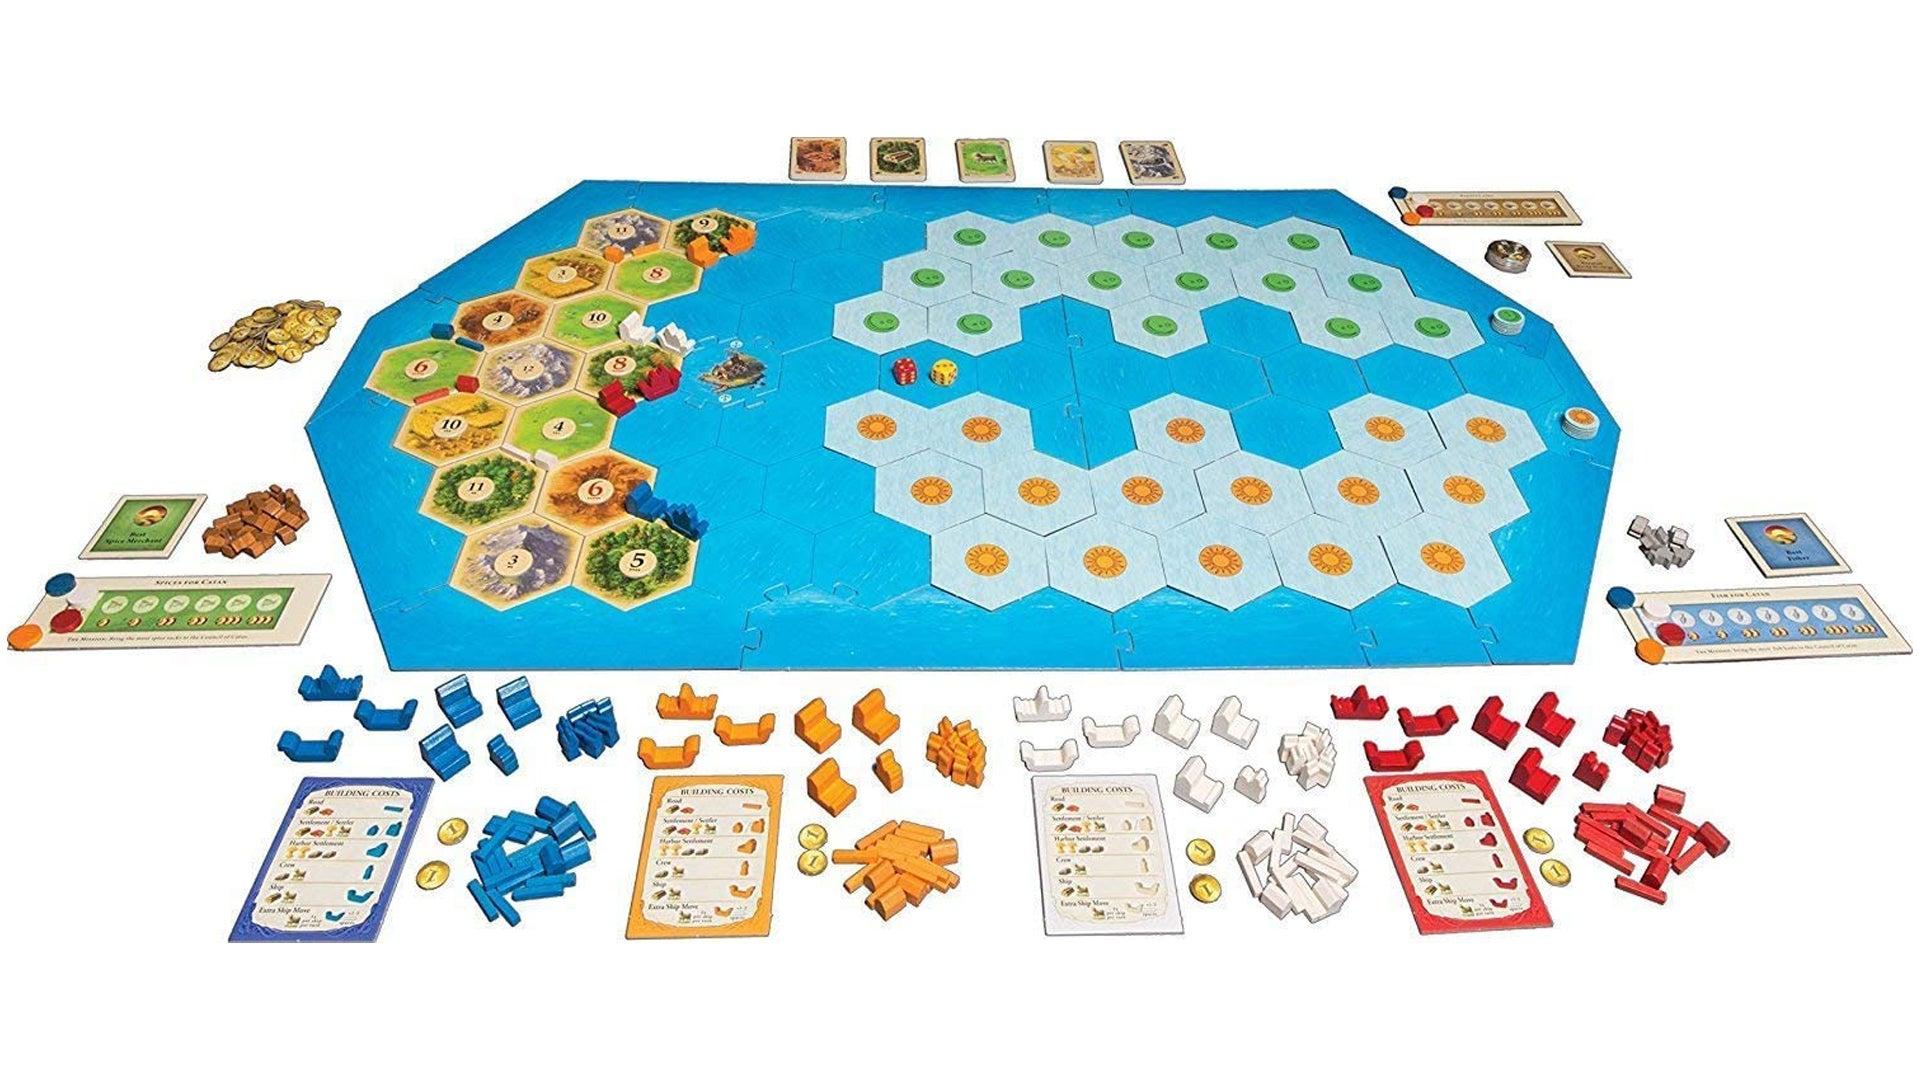 catan-expansion-explorers-and-pirates-gameplay.jpg